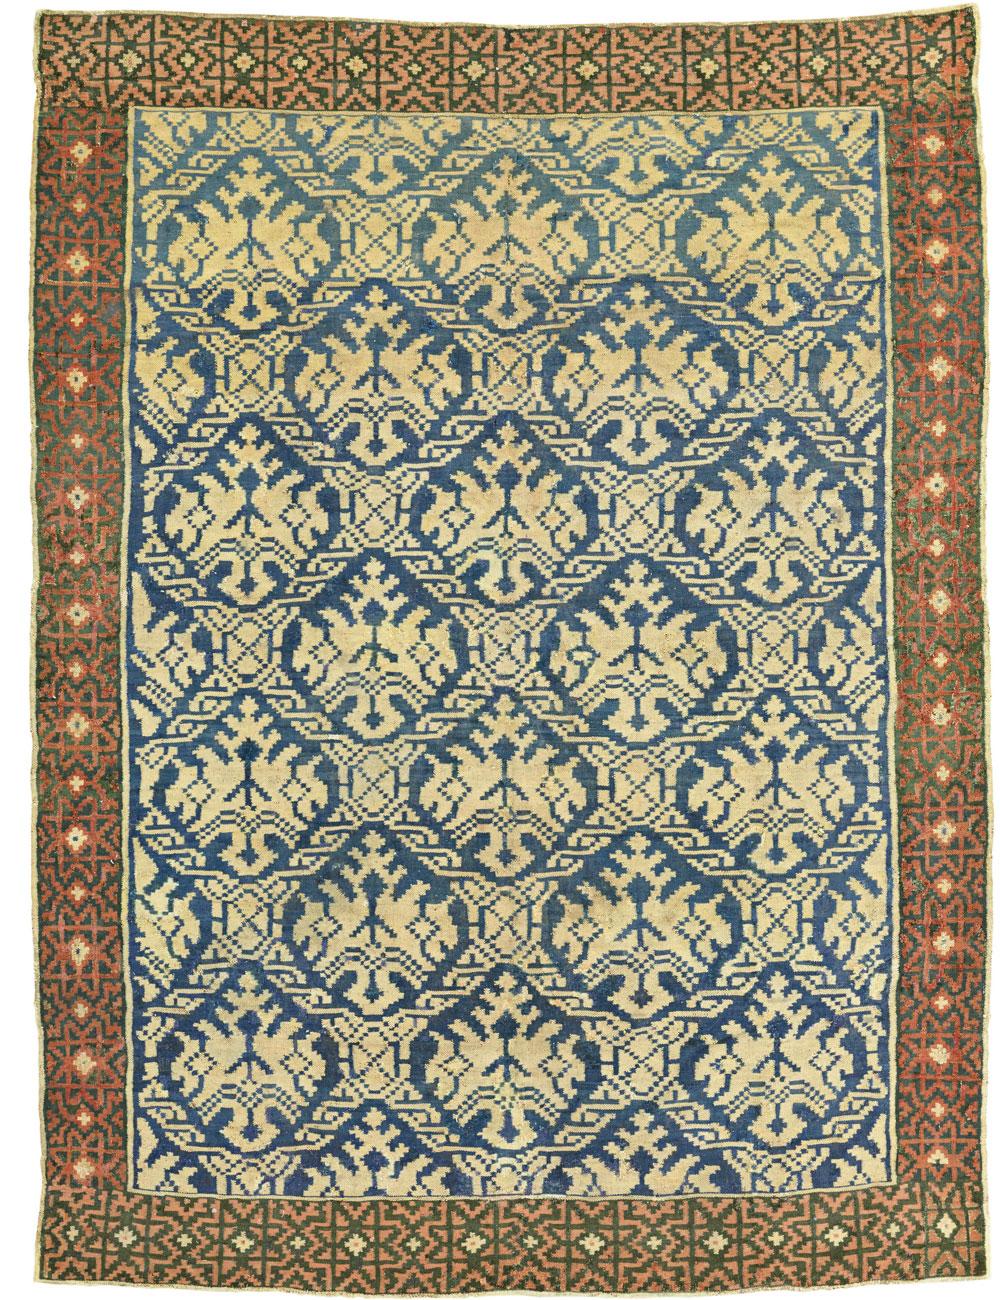 Carpet, Spain, possibly Alcaraz